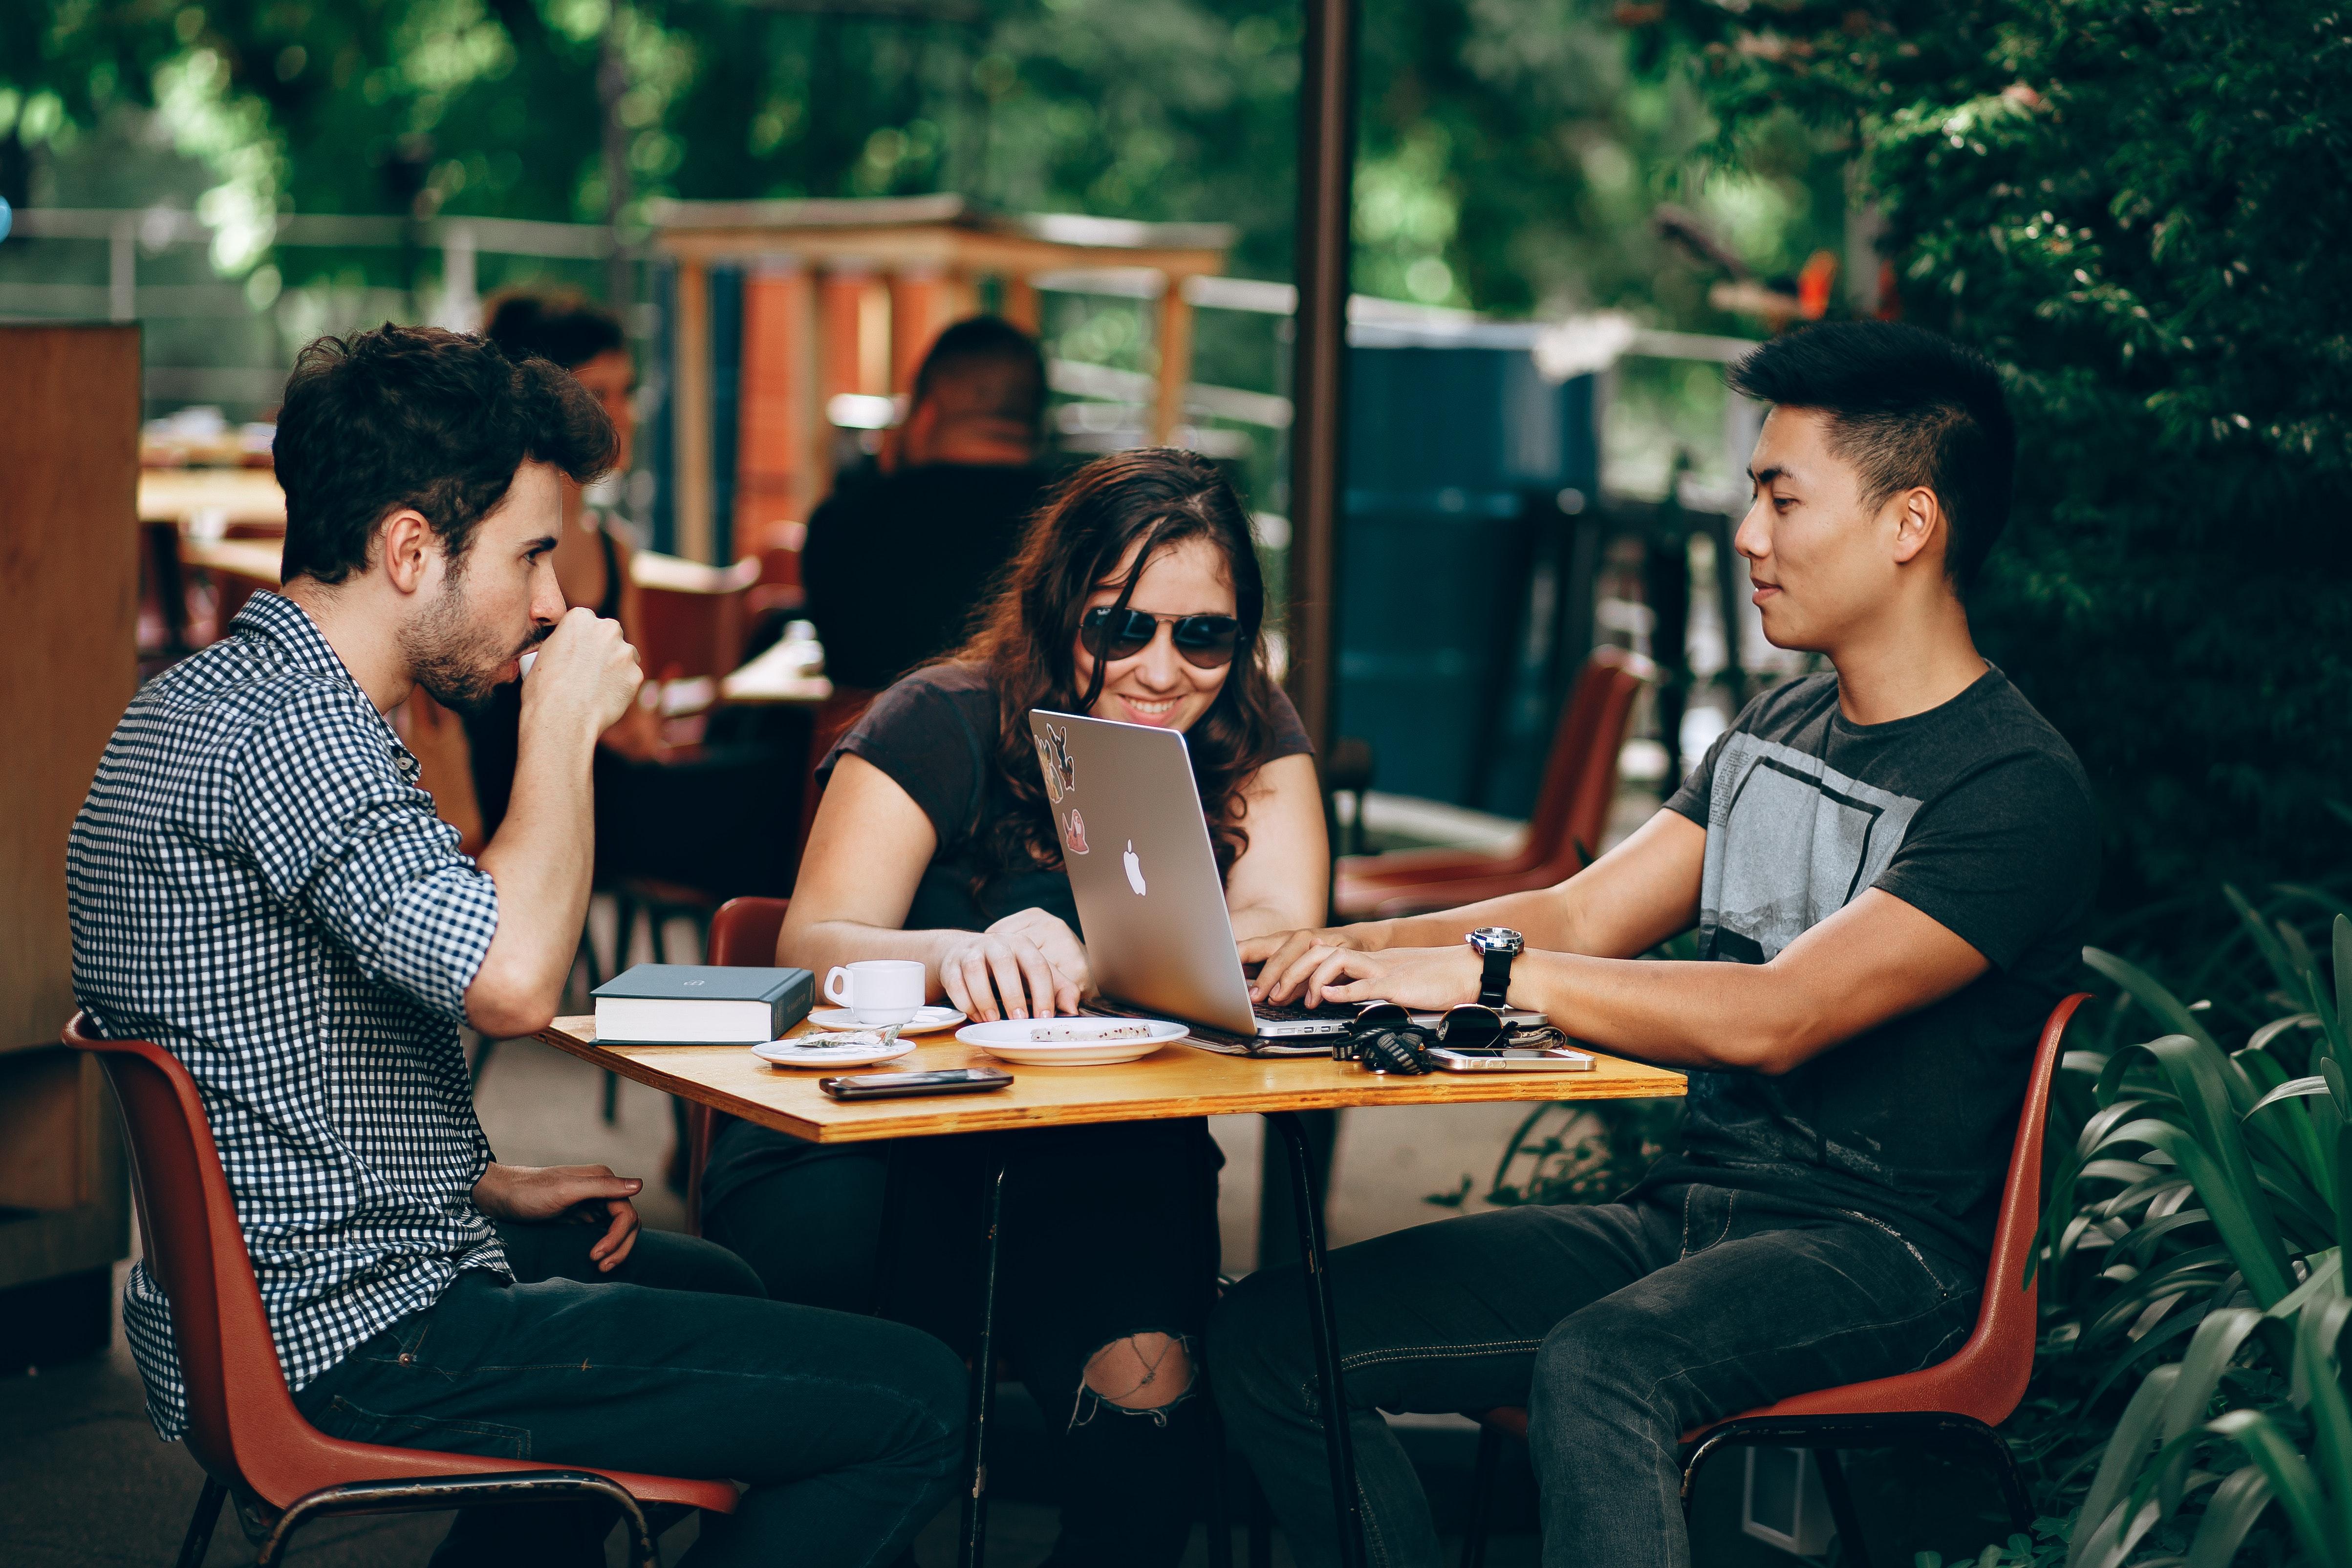 Balancing The Social/Working Balance Of College